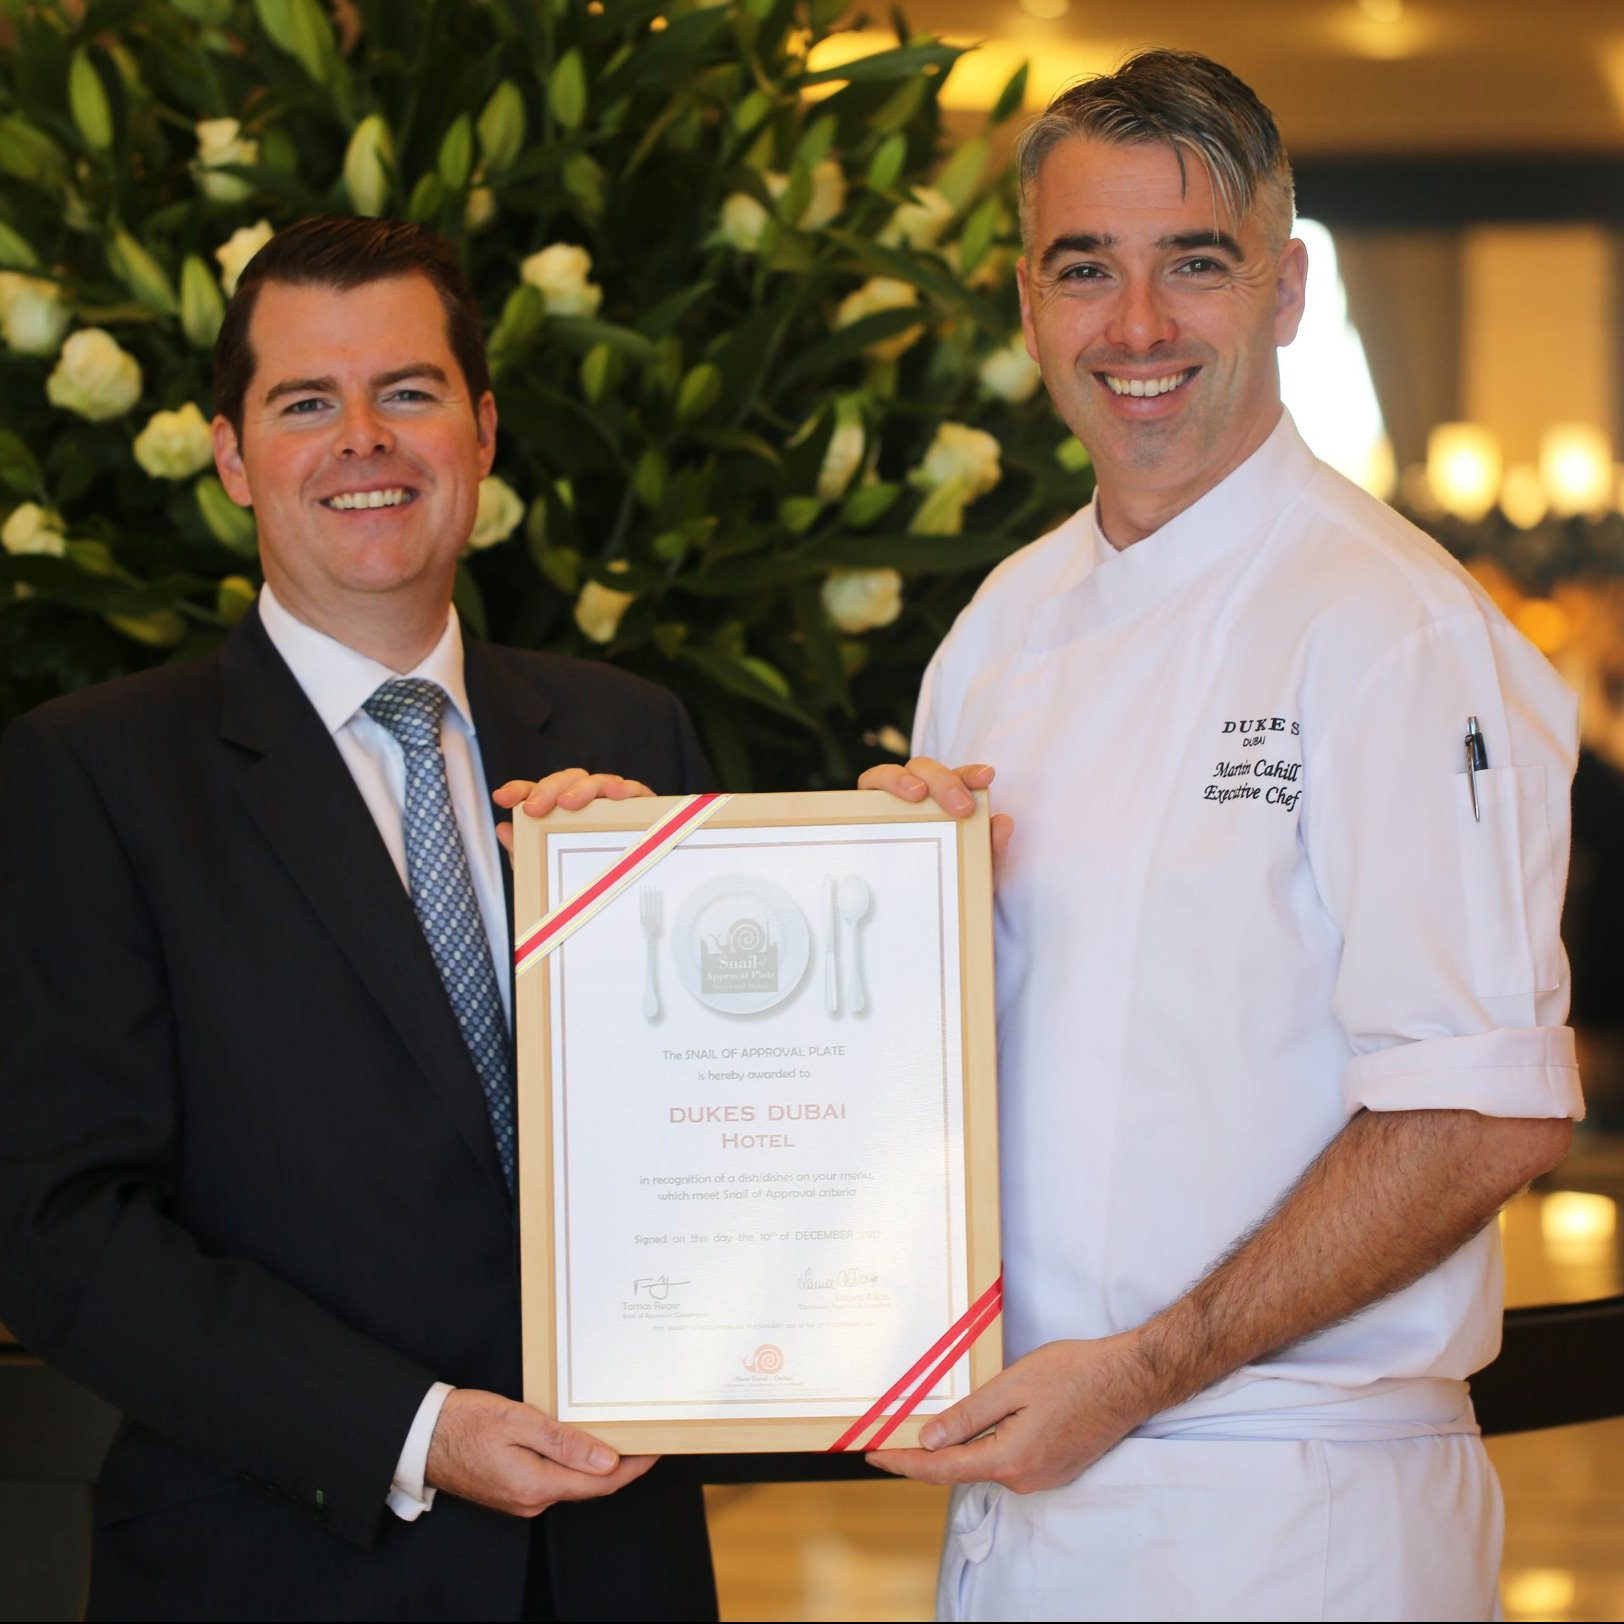 Carl Chapman, Dukes director of F&B, with Martin Cahill, executive chef Dukes Dubai with the award